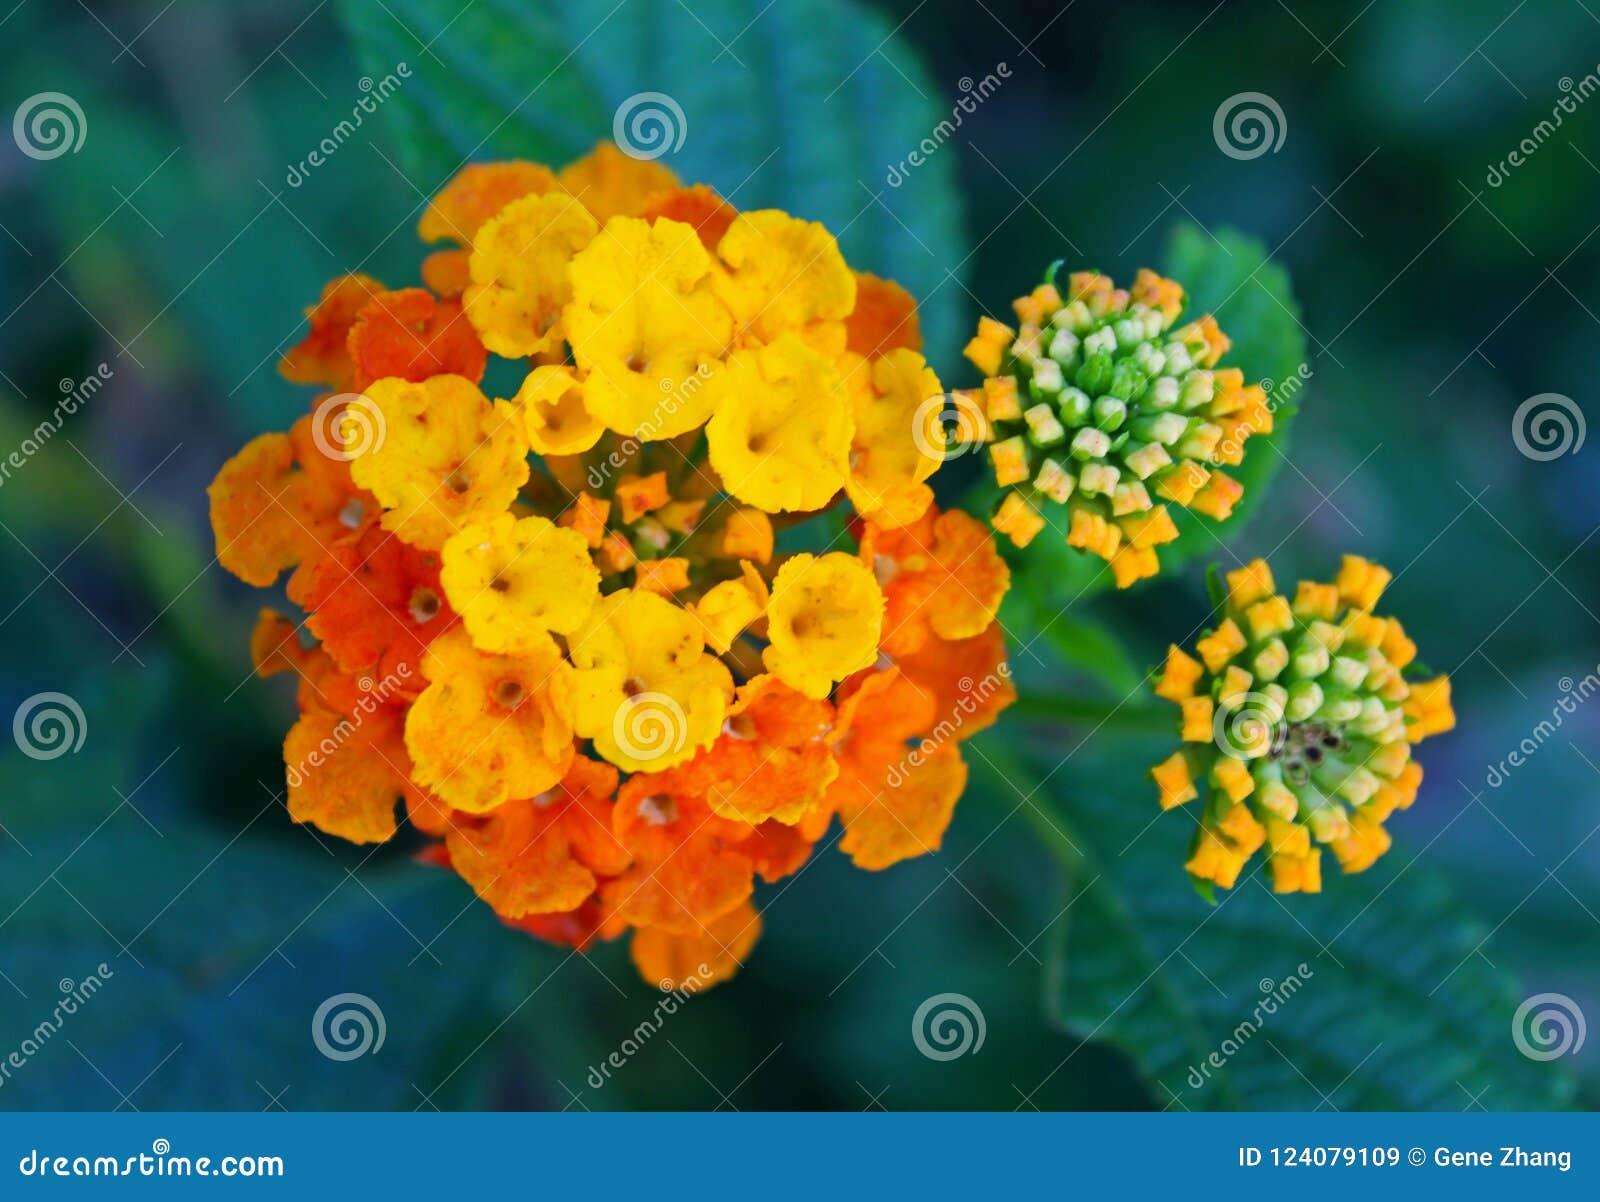 Yellow And Orange Lantana Stock Image Image Of Color 124079109